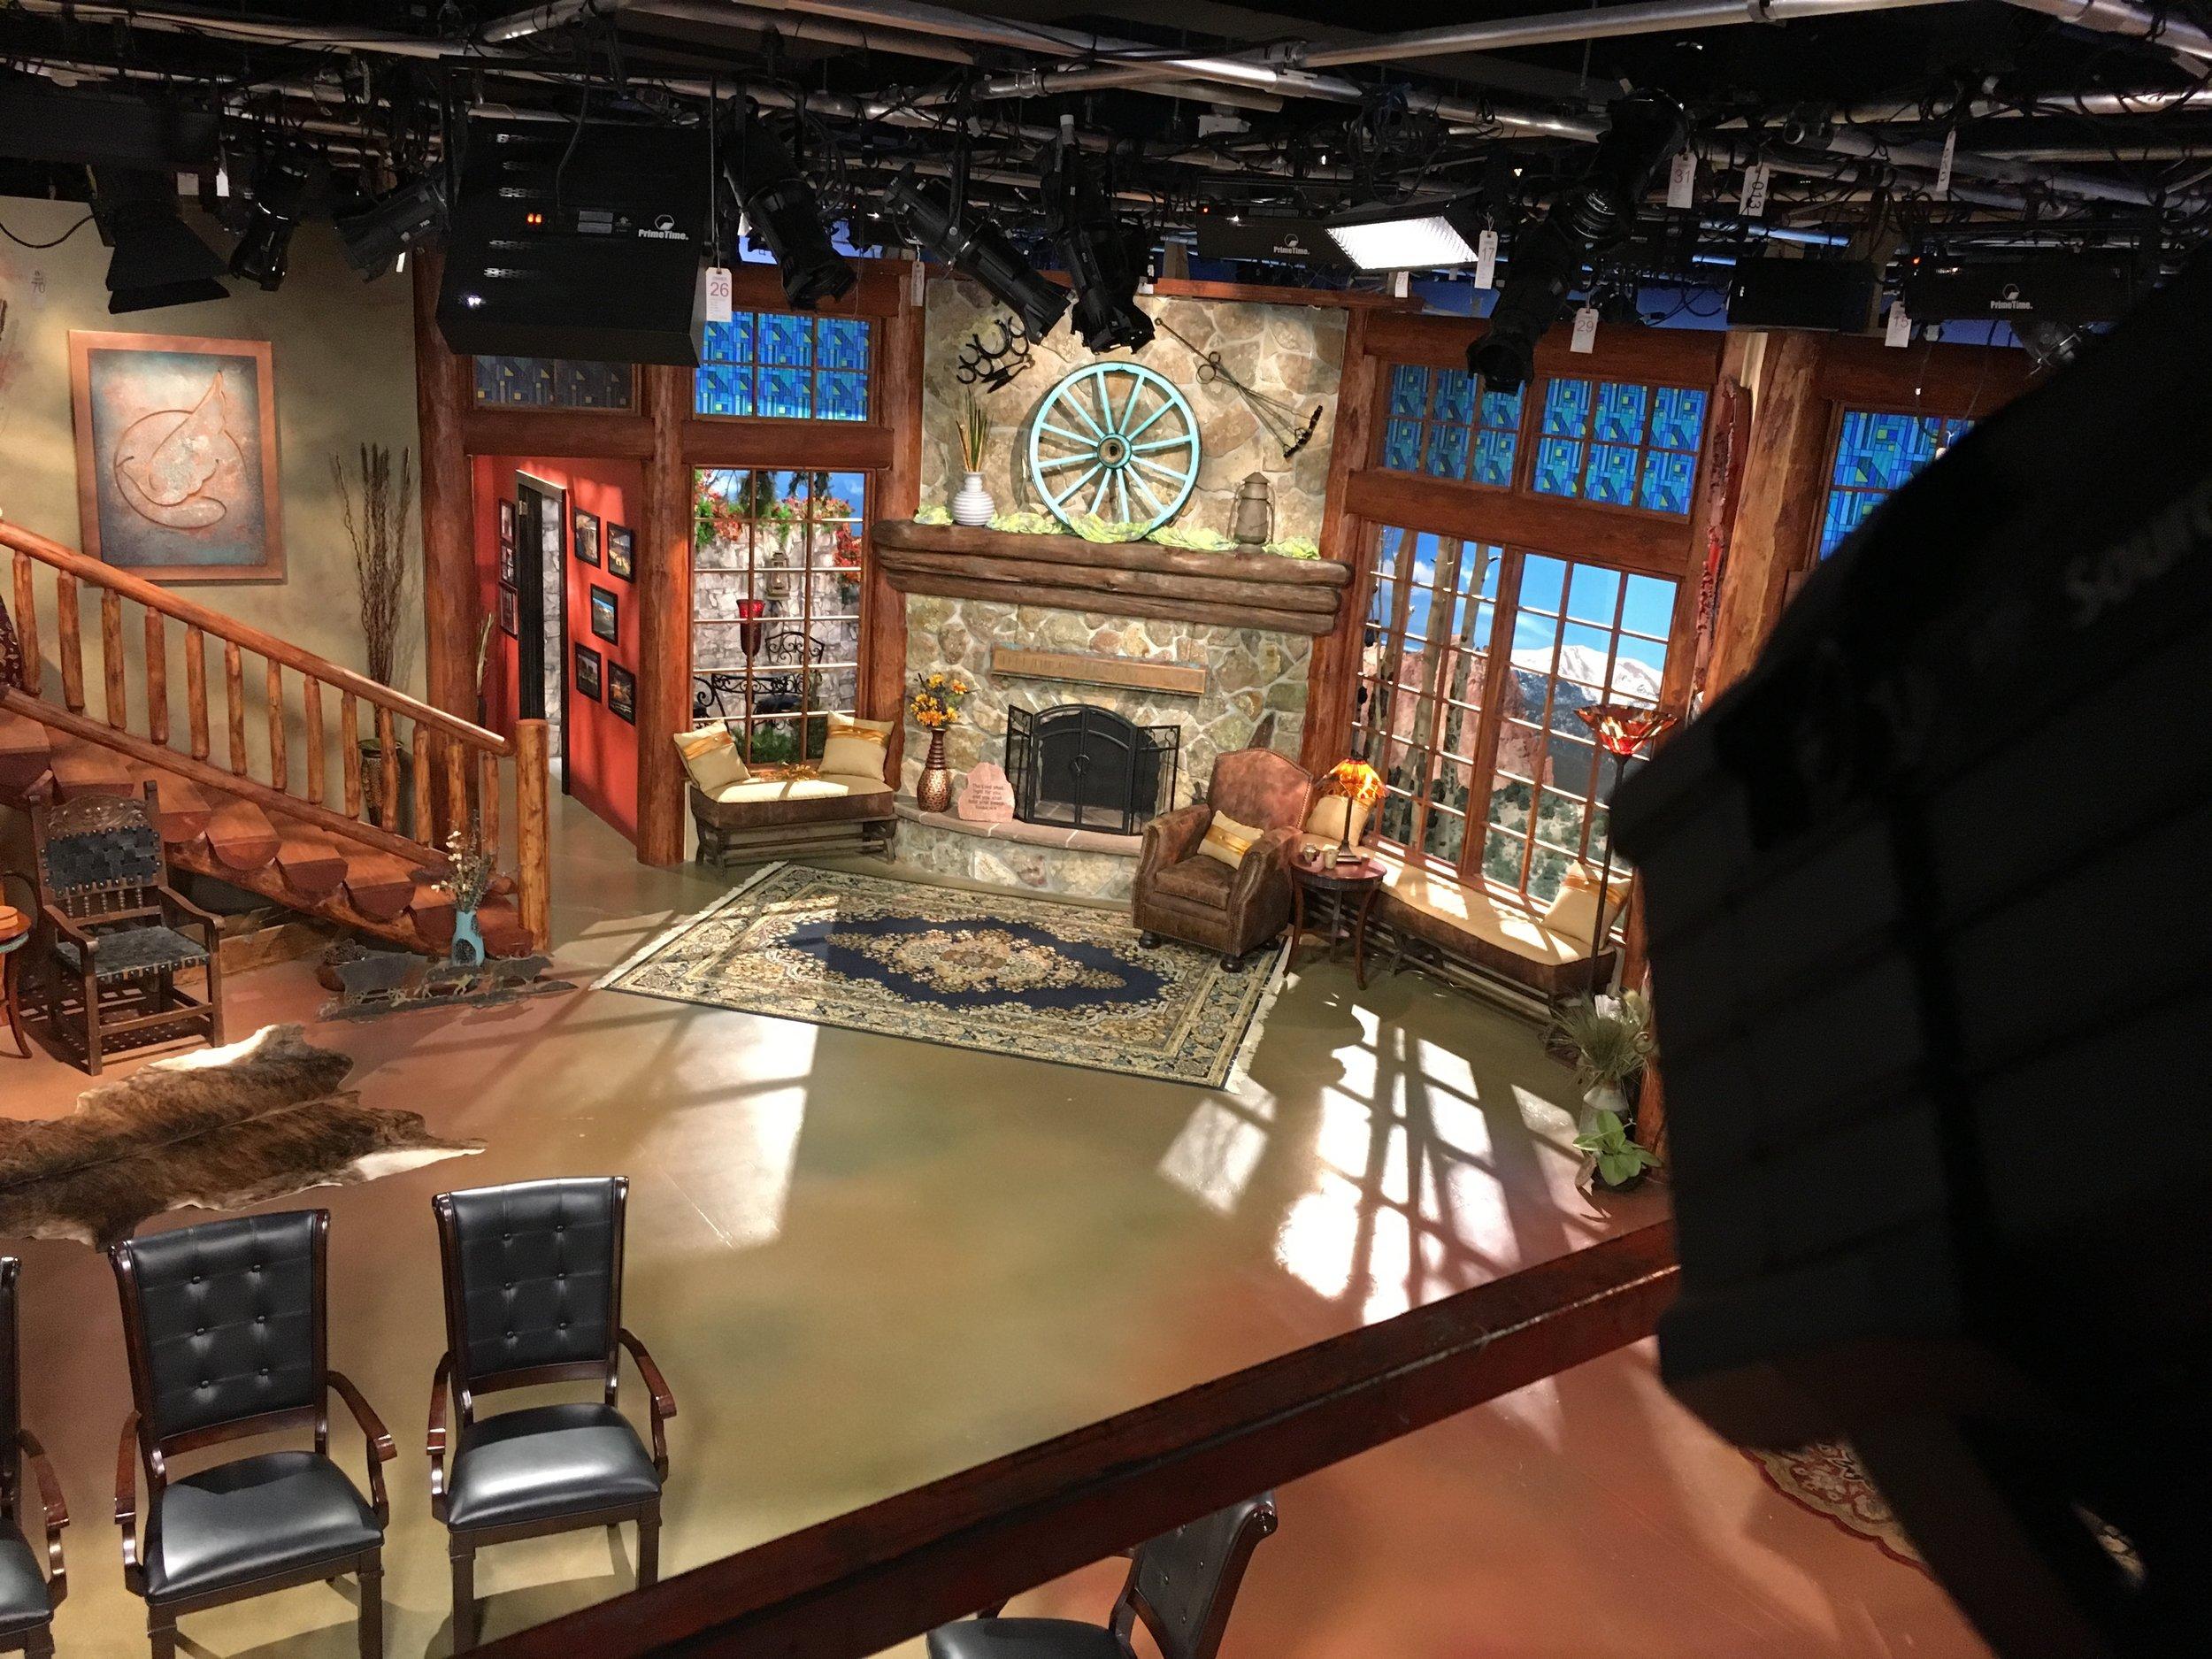 Andew Wolmack Live TV studio Re-light